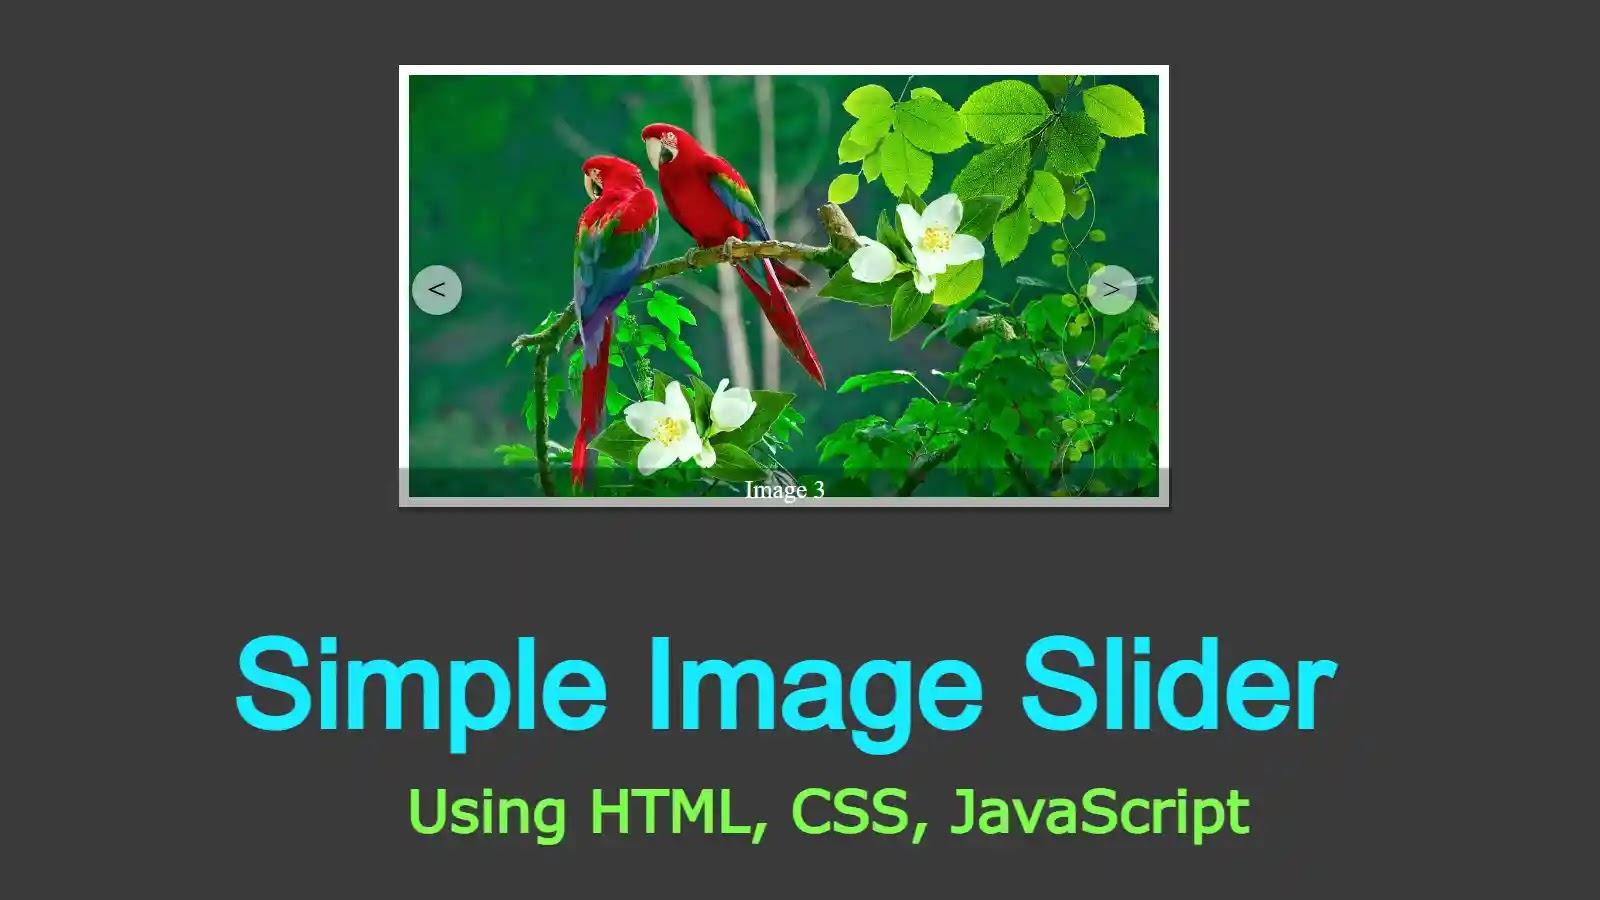 Creating Image Slider Using HTML, CSS, and javaScript